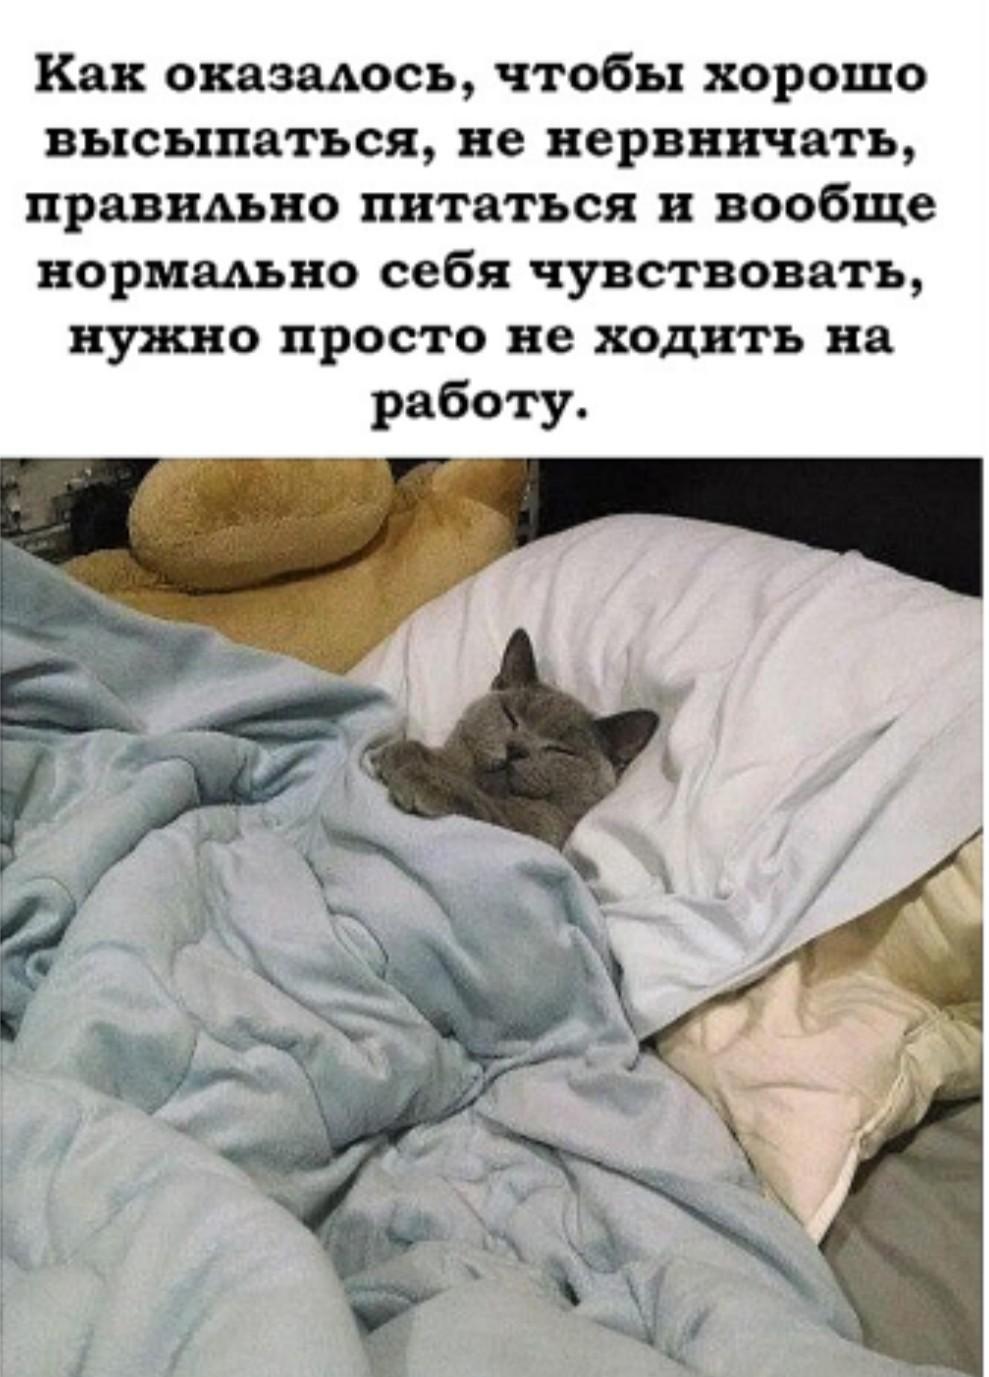 https://s00.yaplakal.com/pics/pics_original/6/5/4/13840456.jpg